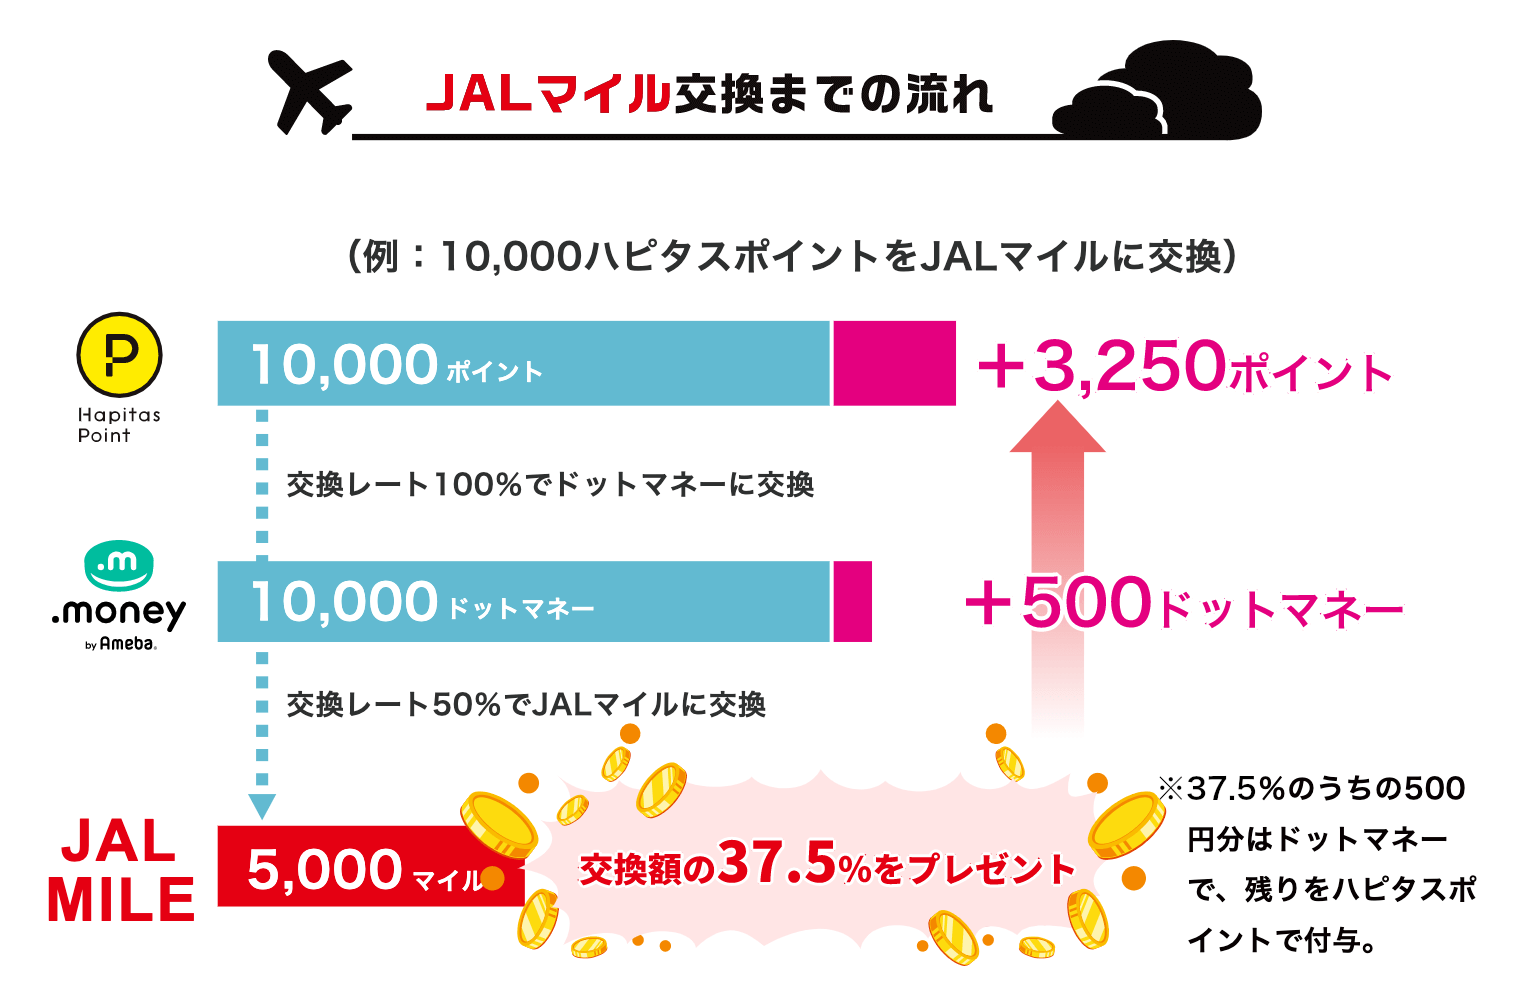 JALマイル交換までの流れ